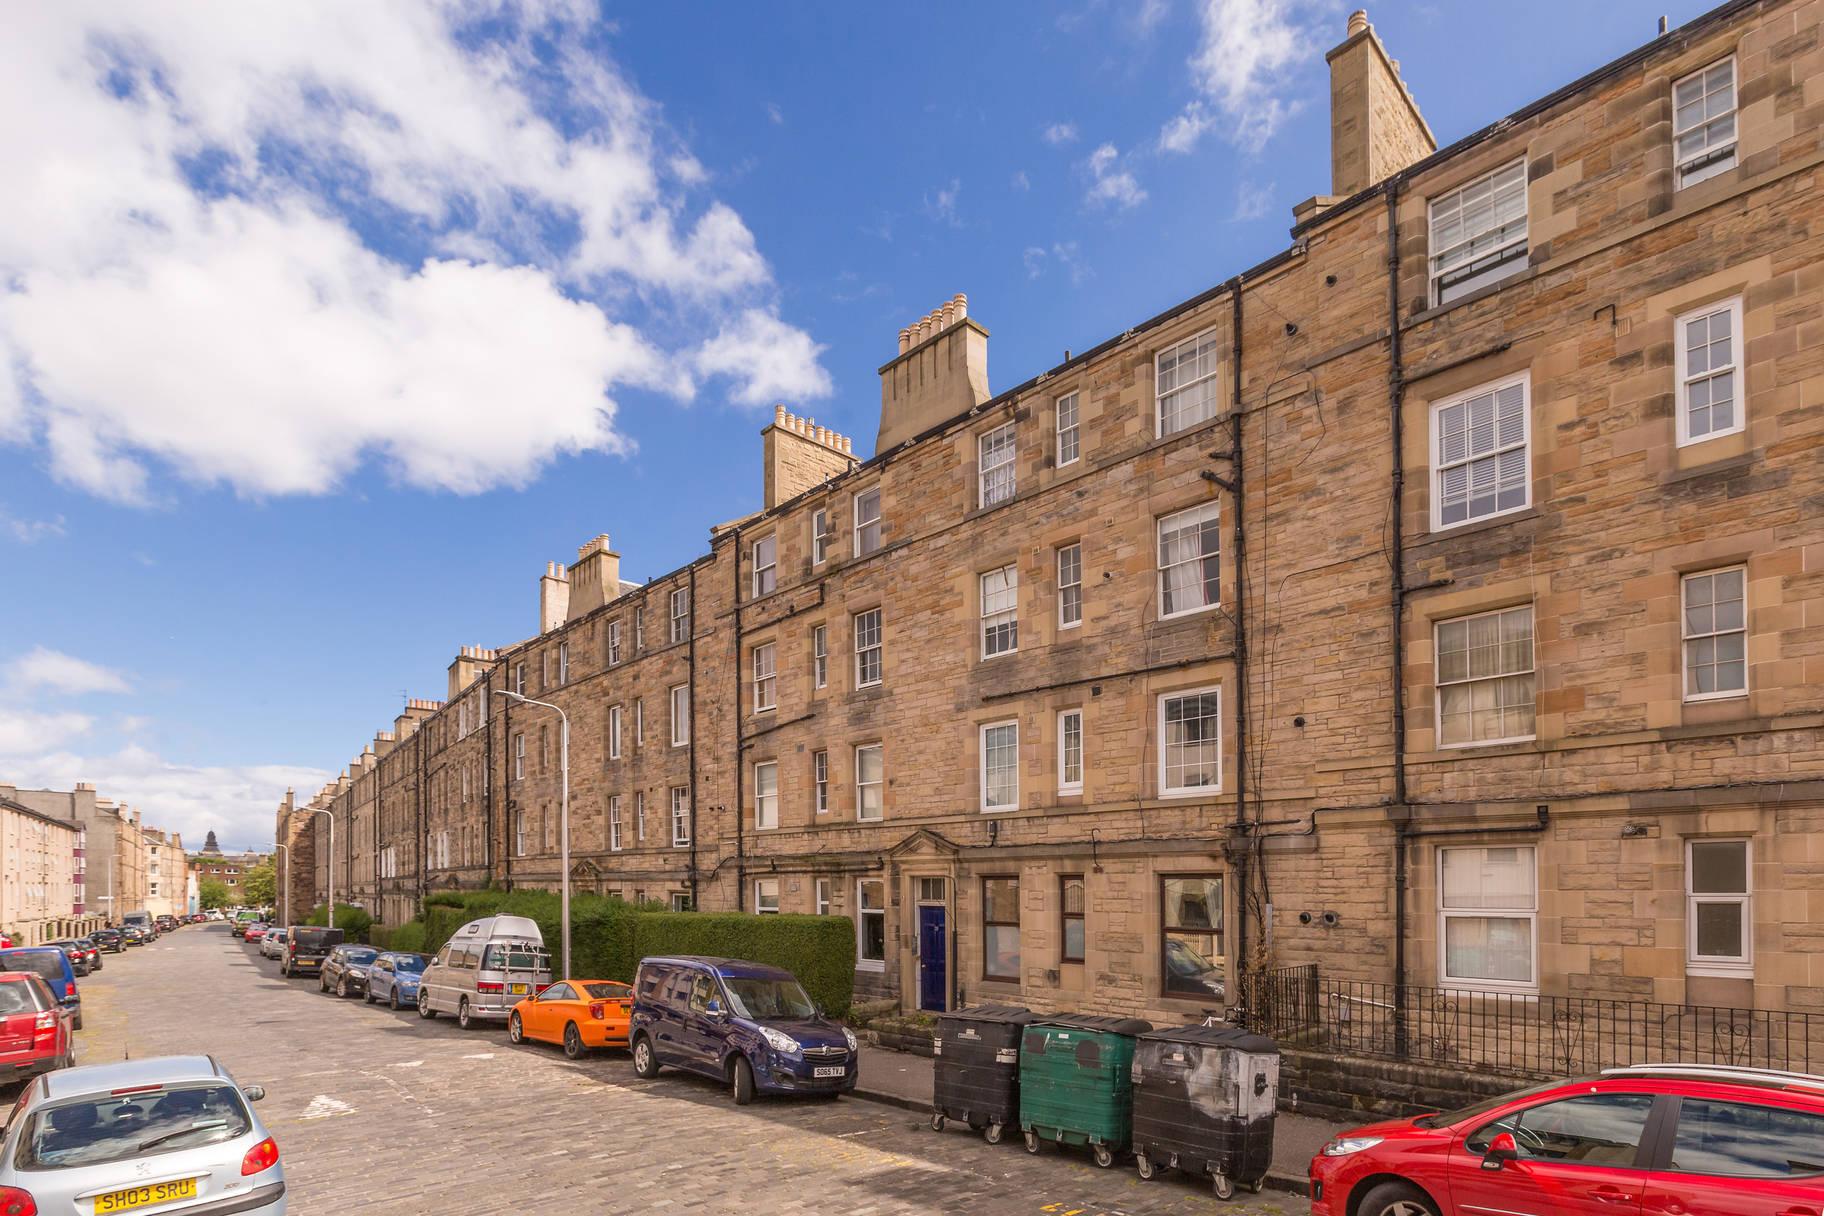 29/1 Halmyre Street, Edinburgh, EH6 8QE